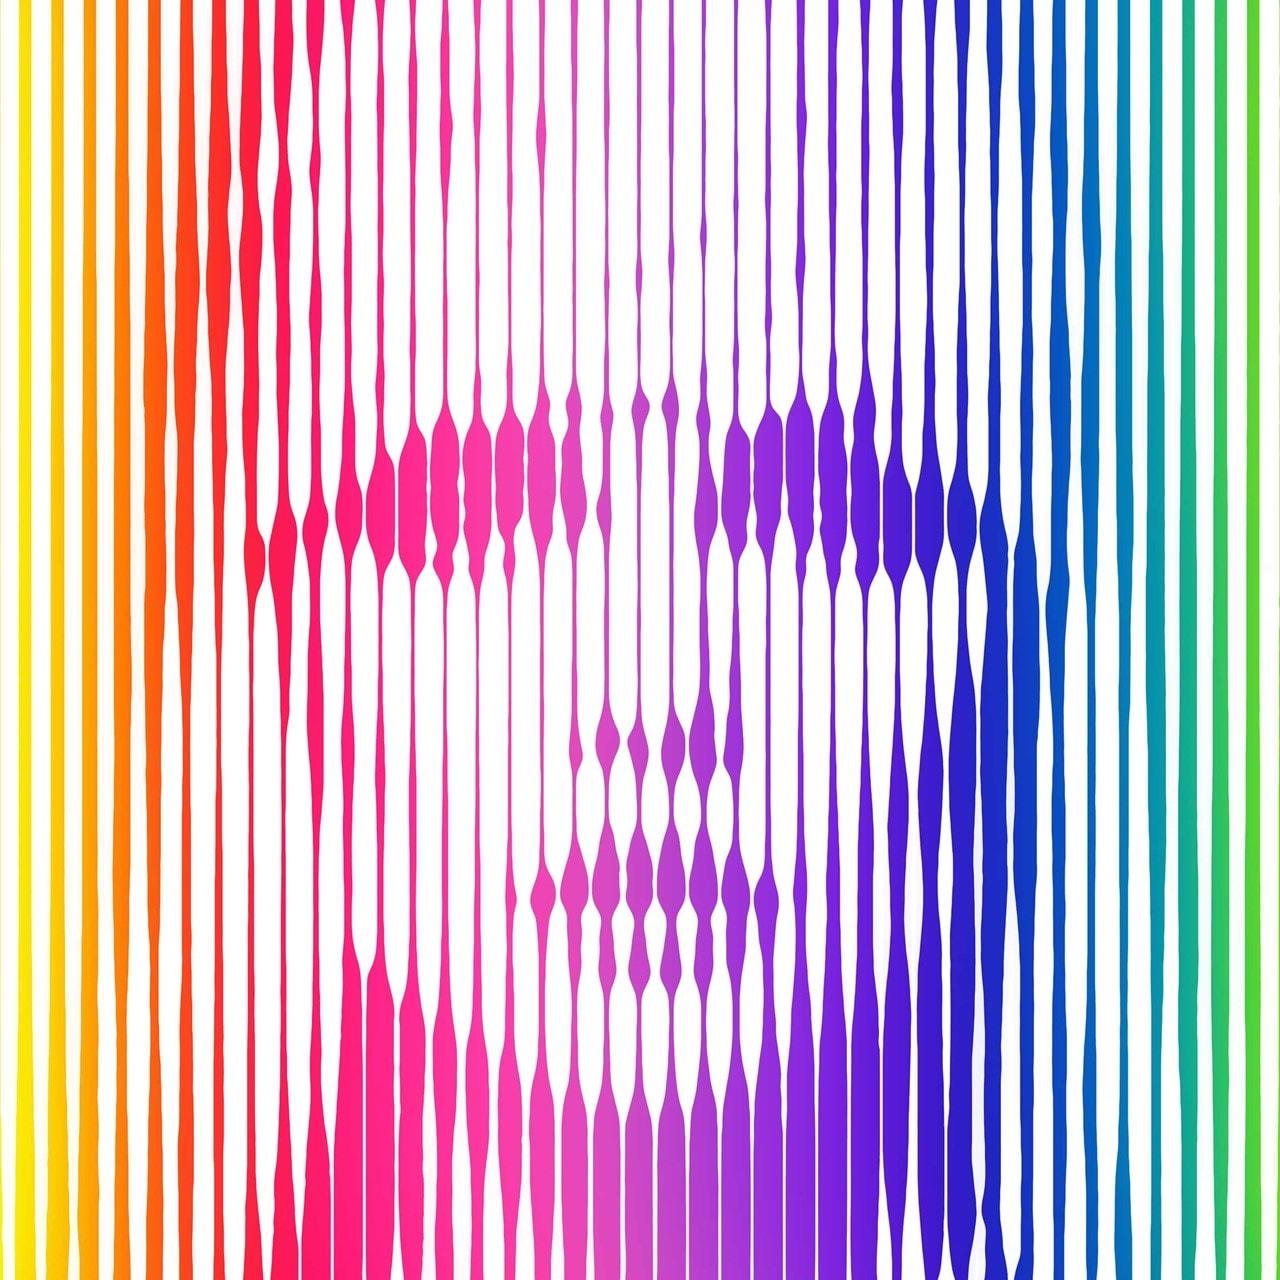 Debbie Harry: Rainbow: Limited Edition Fine Art Print By Veebee - 1